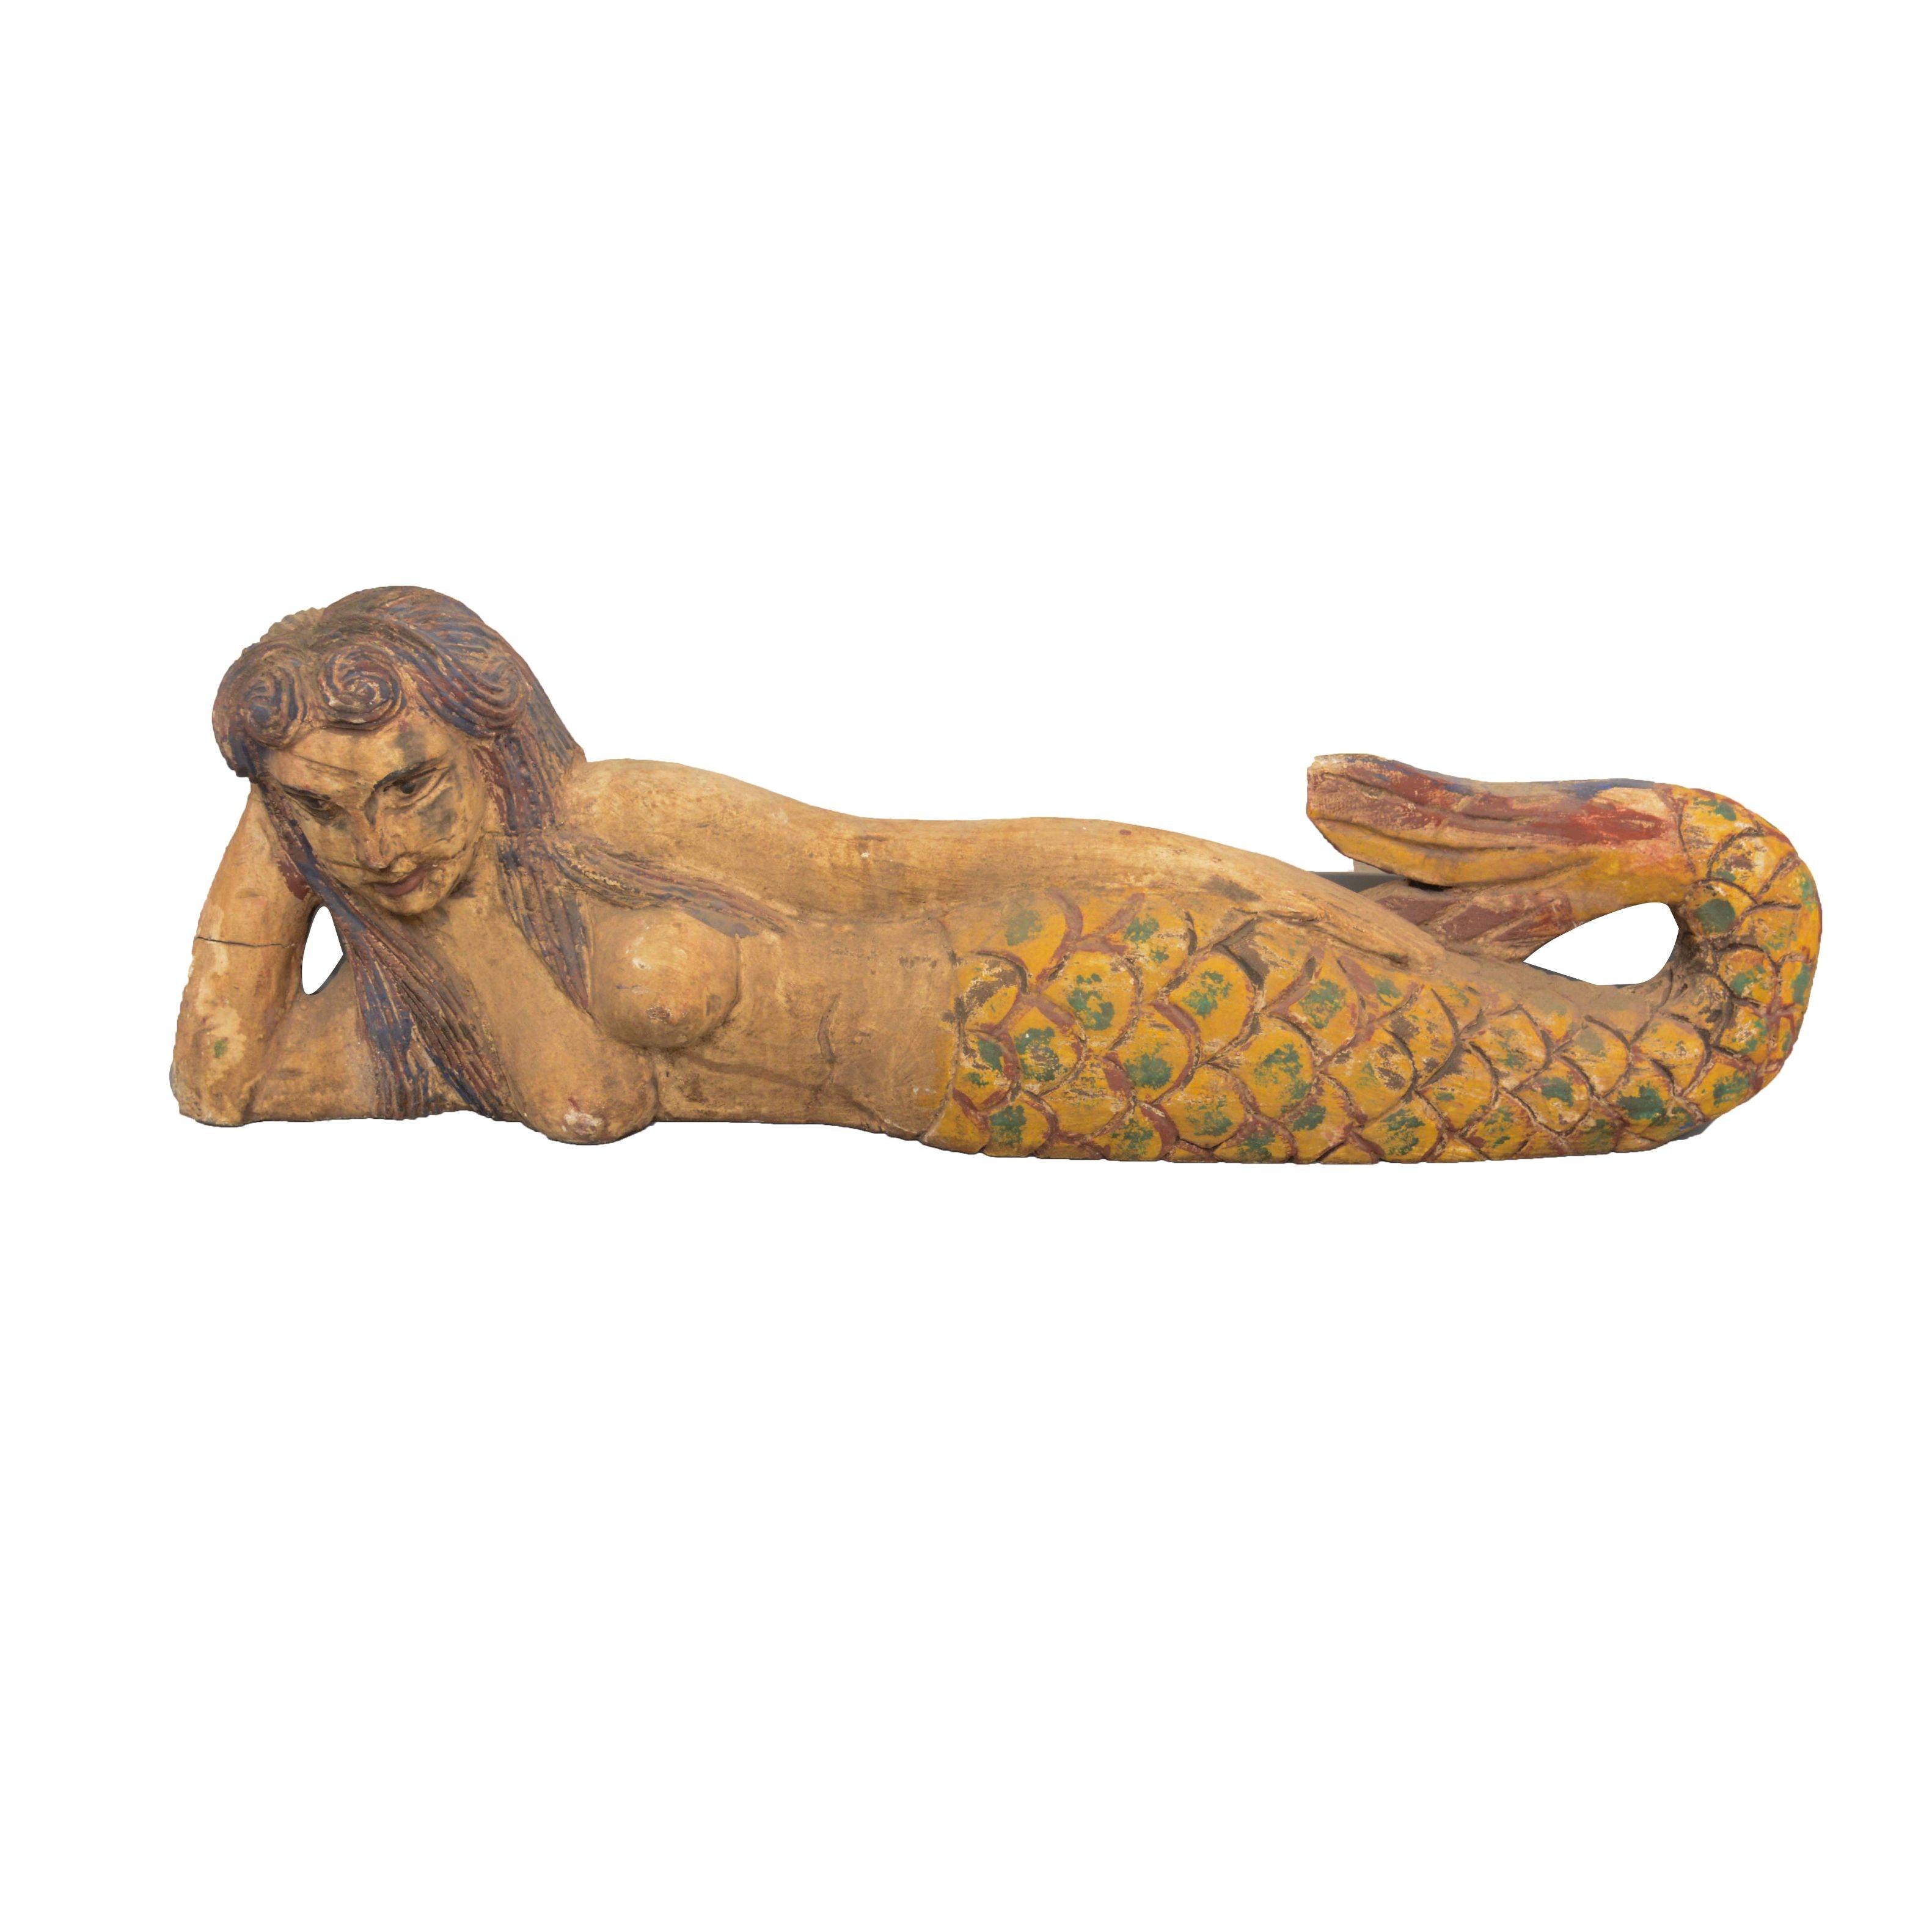 Carved Folk Art-Style Mermaid Sculpture